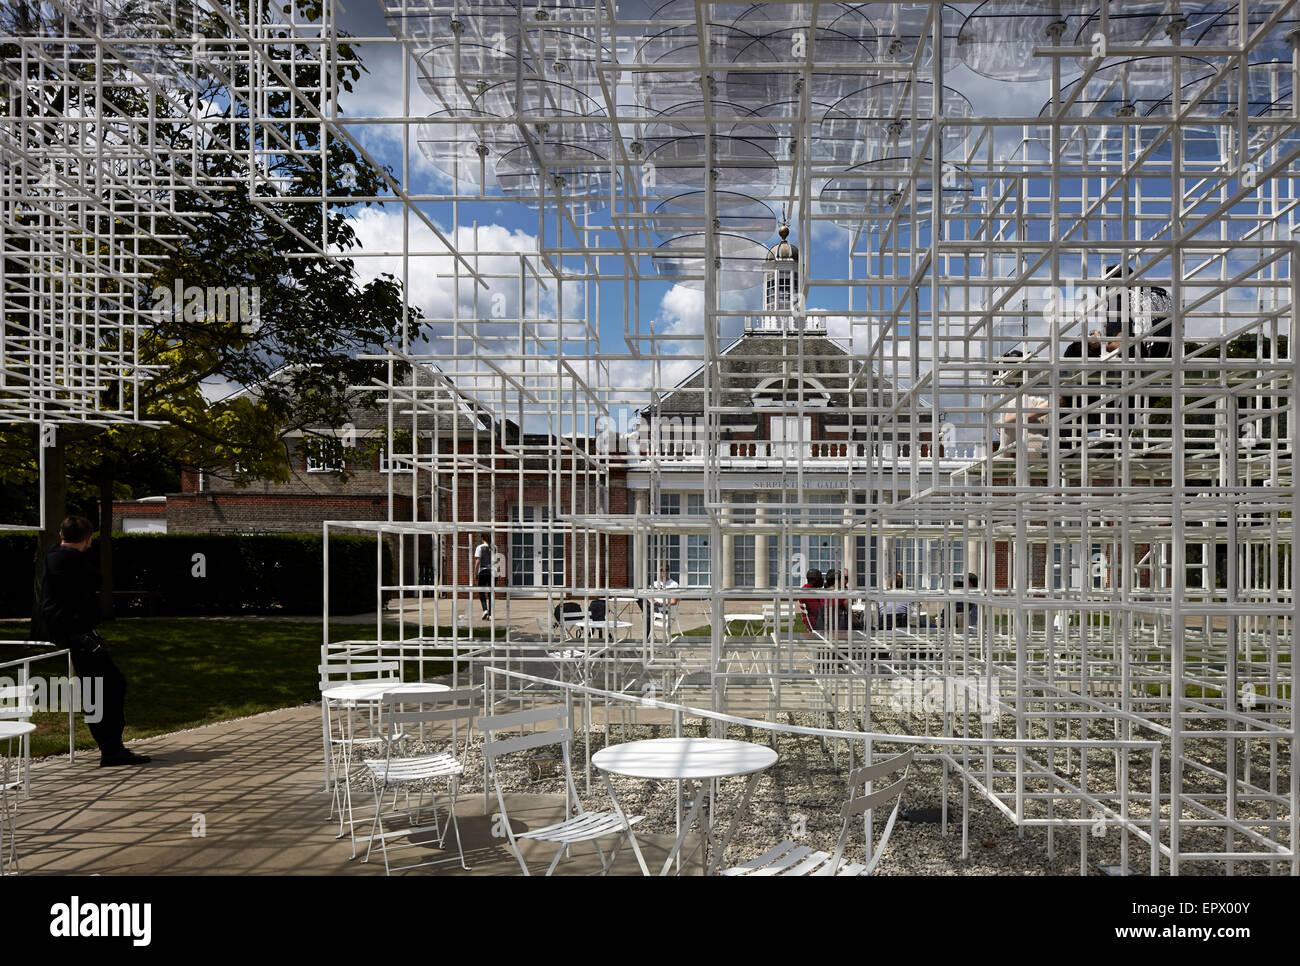 Temporary architectural installation, the Serpentine Pavilion 2013, Kensington Gardens, London, England, UK - Stock Image